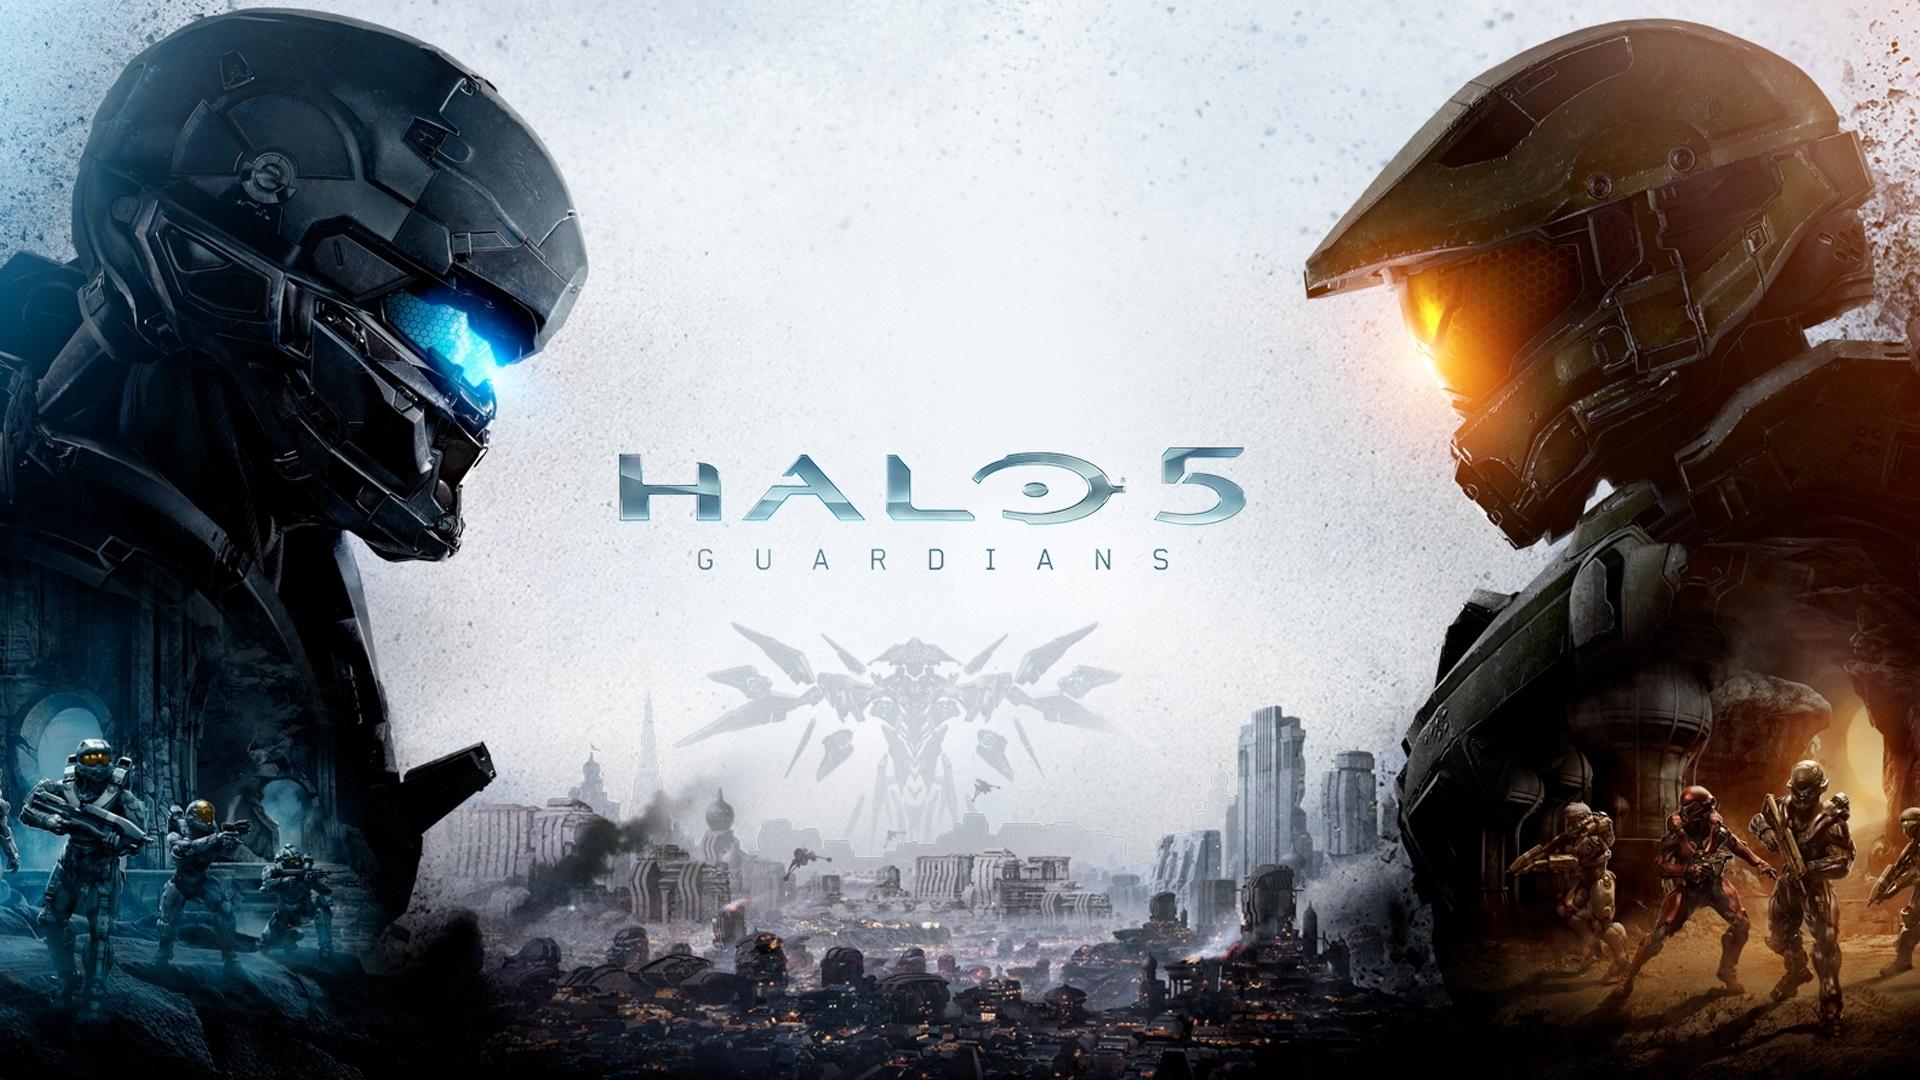 Halo 5 Guardians Xbox Live Key | Region Free | English